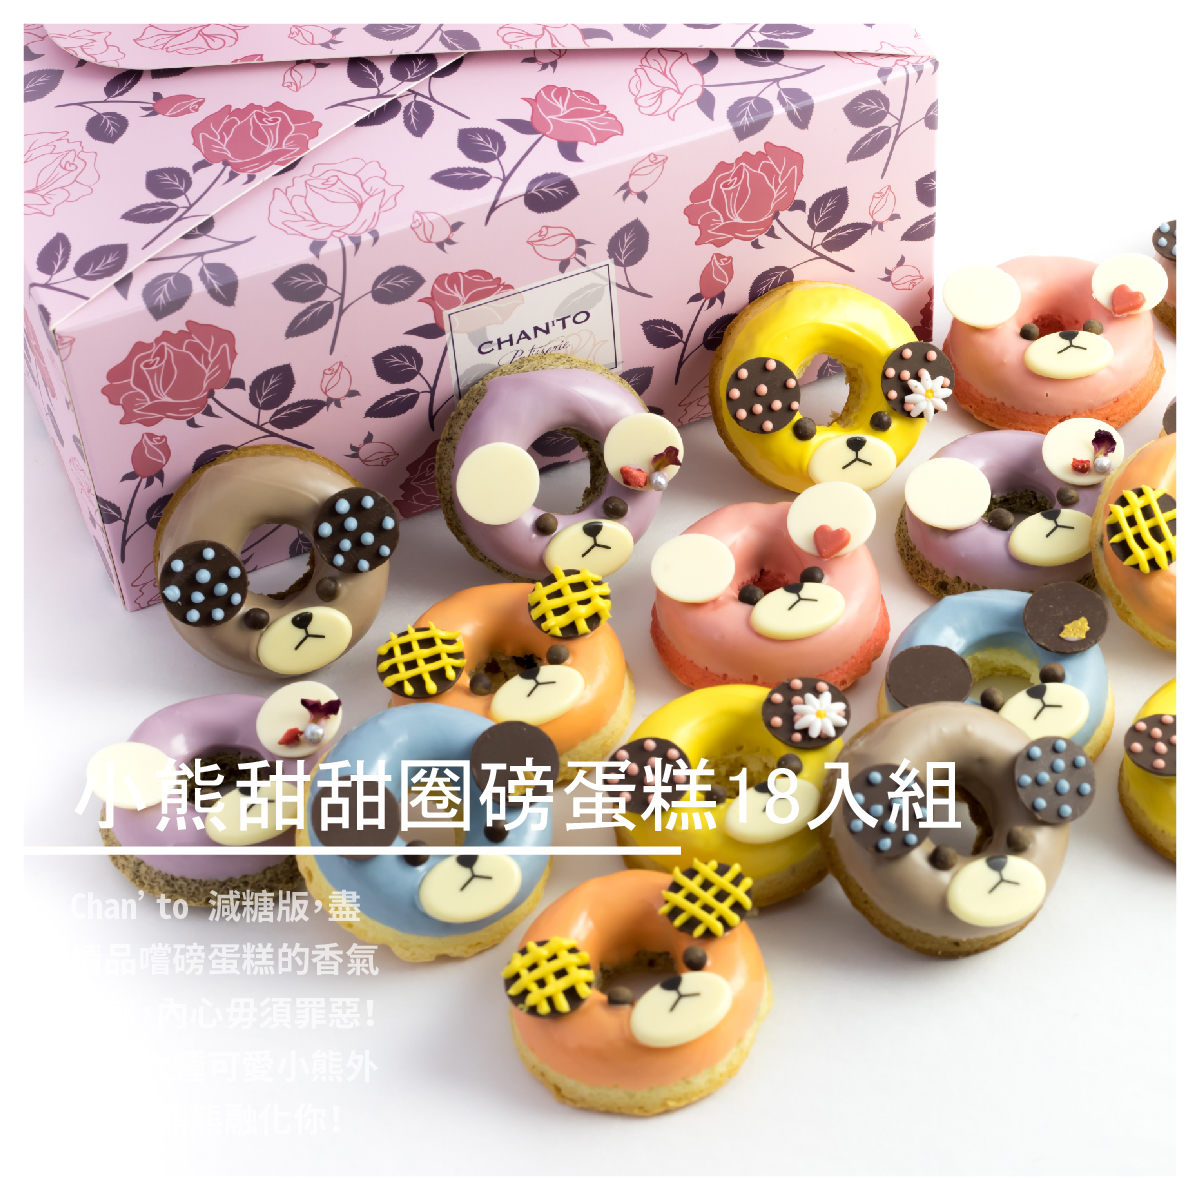 【CHAN'TO Patisserie】小熊甜甜圈磅蛋糕18入組